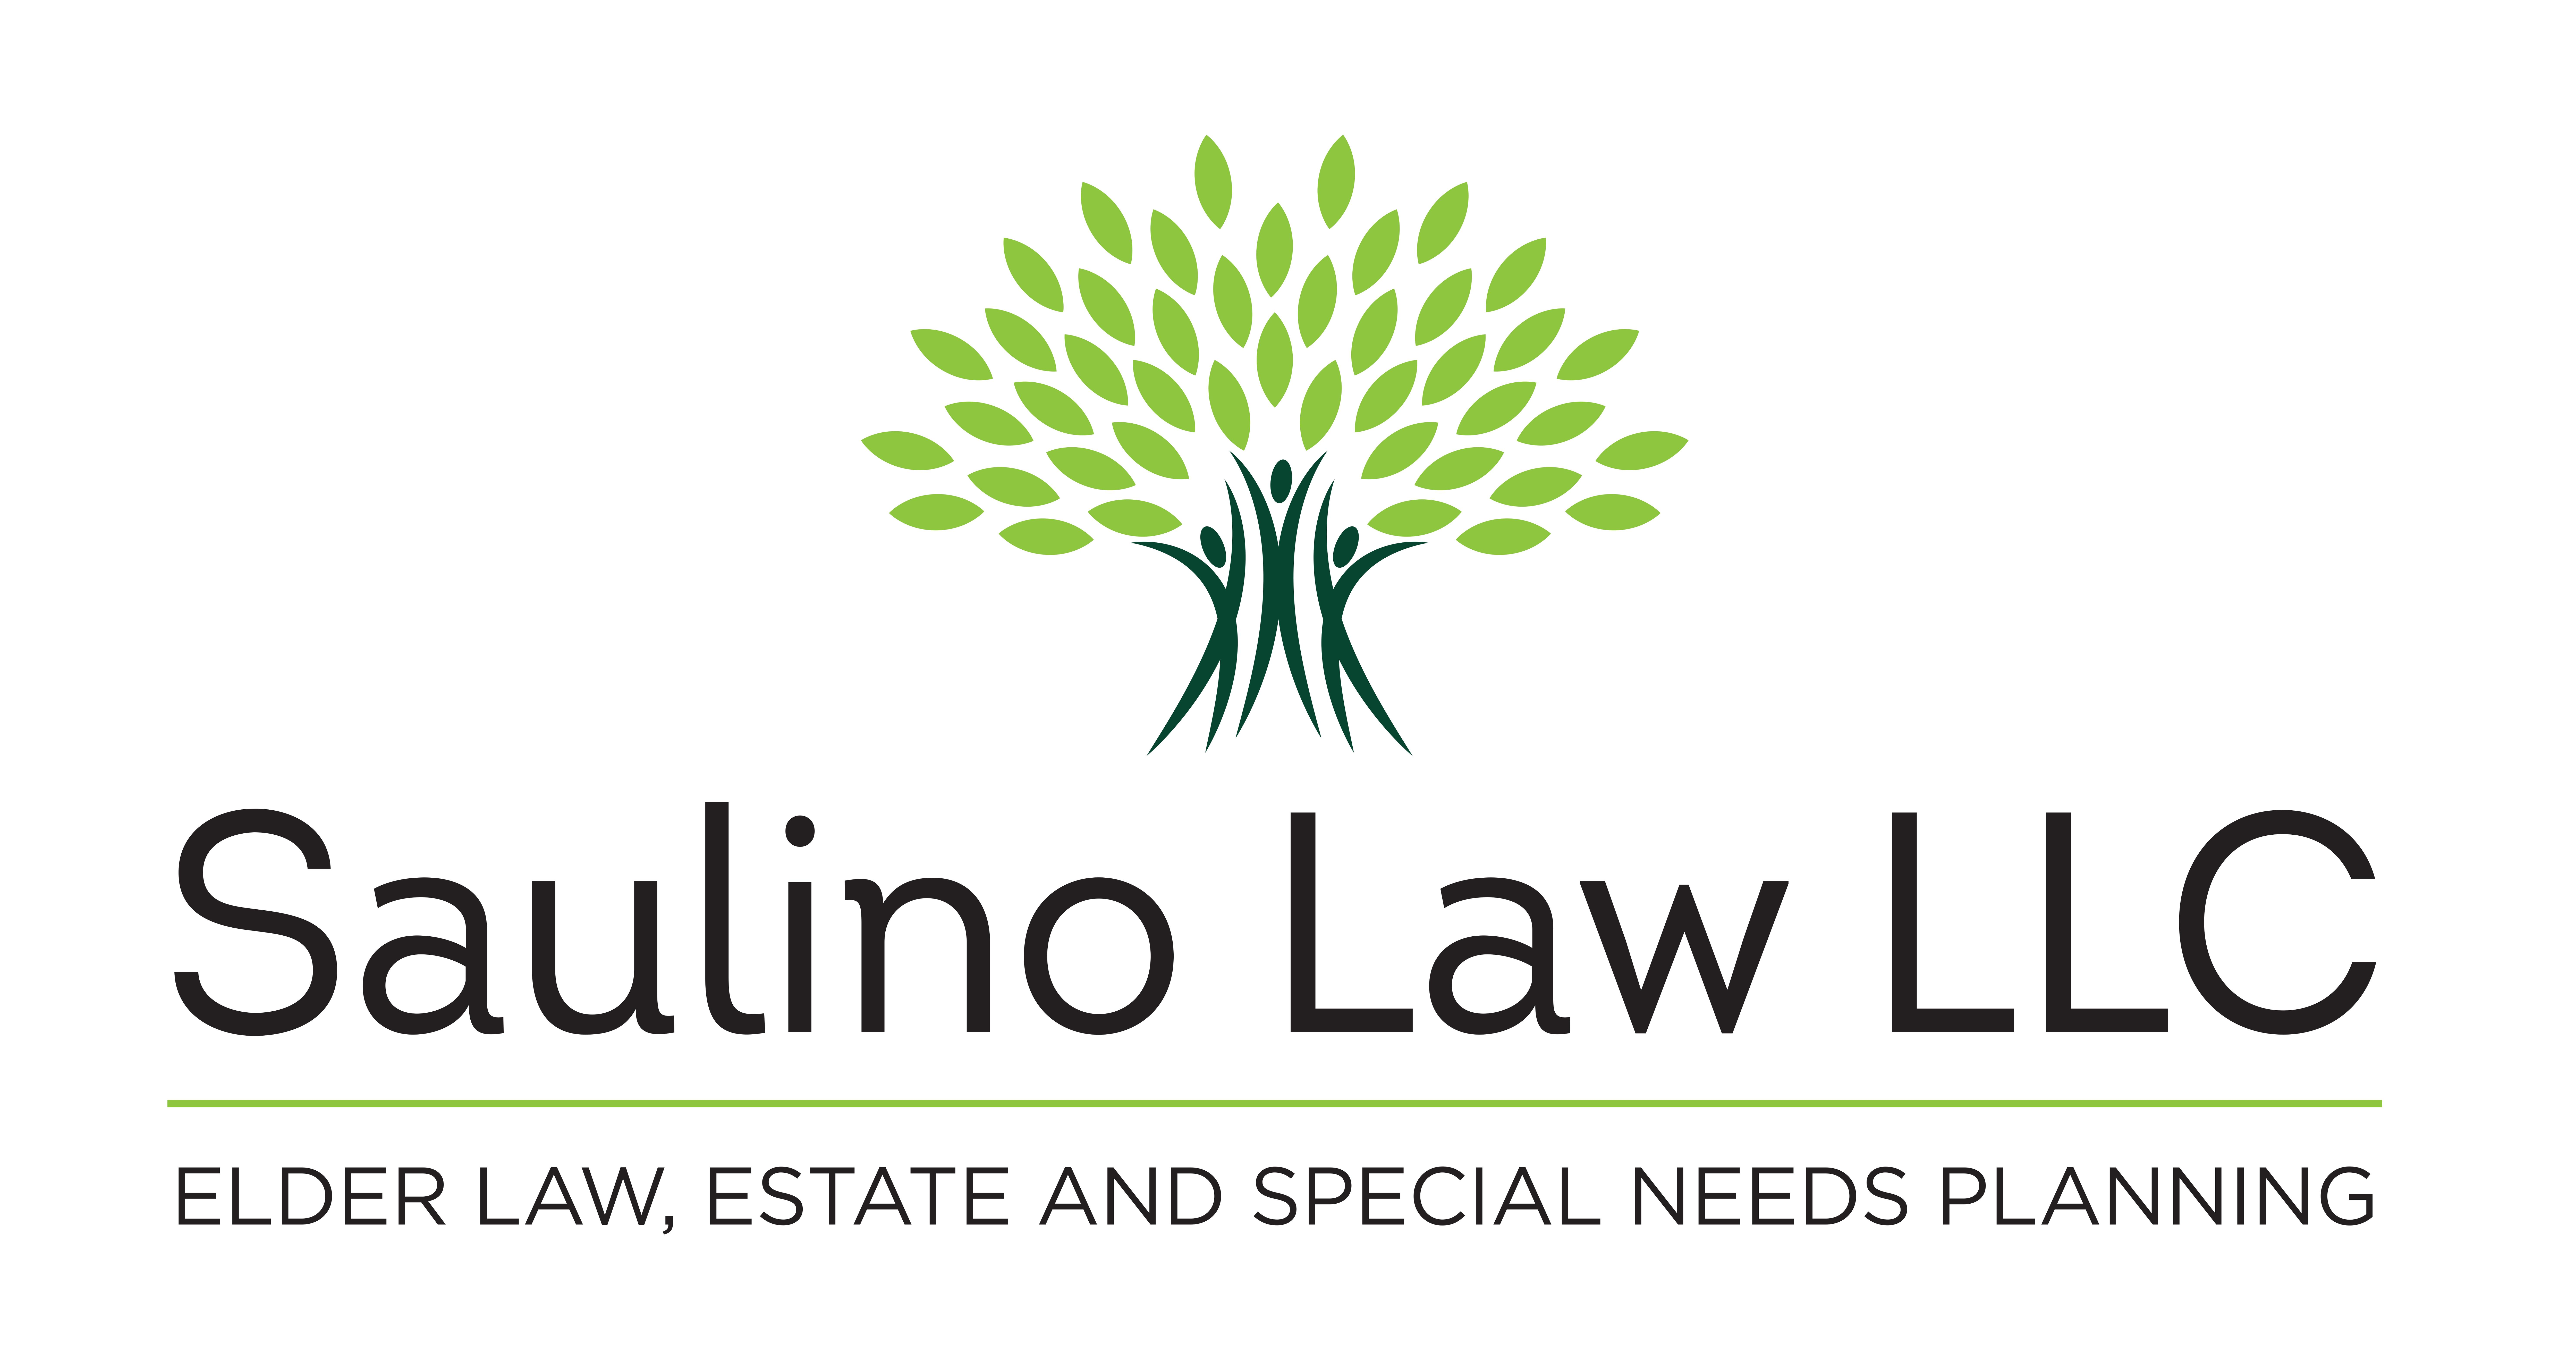 Saulino Law